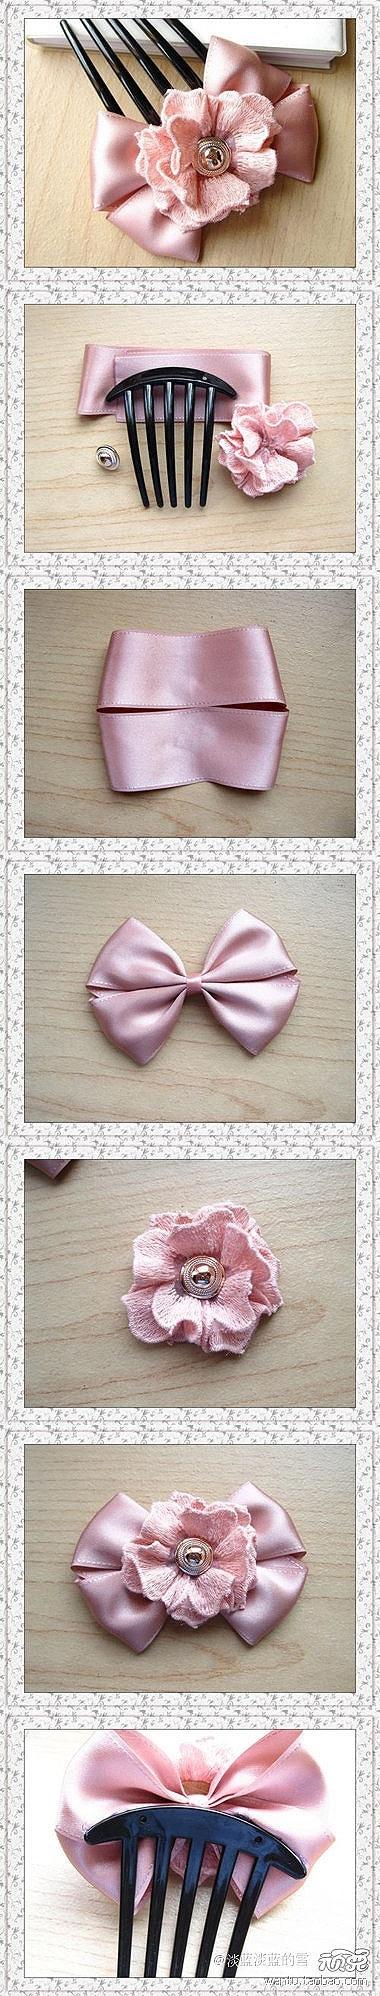 Diy hair bow pictures photos and images for facebook tumblr diy hair bow solutioingenieria Choice Image